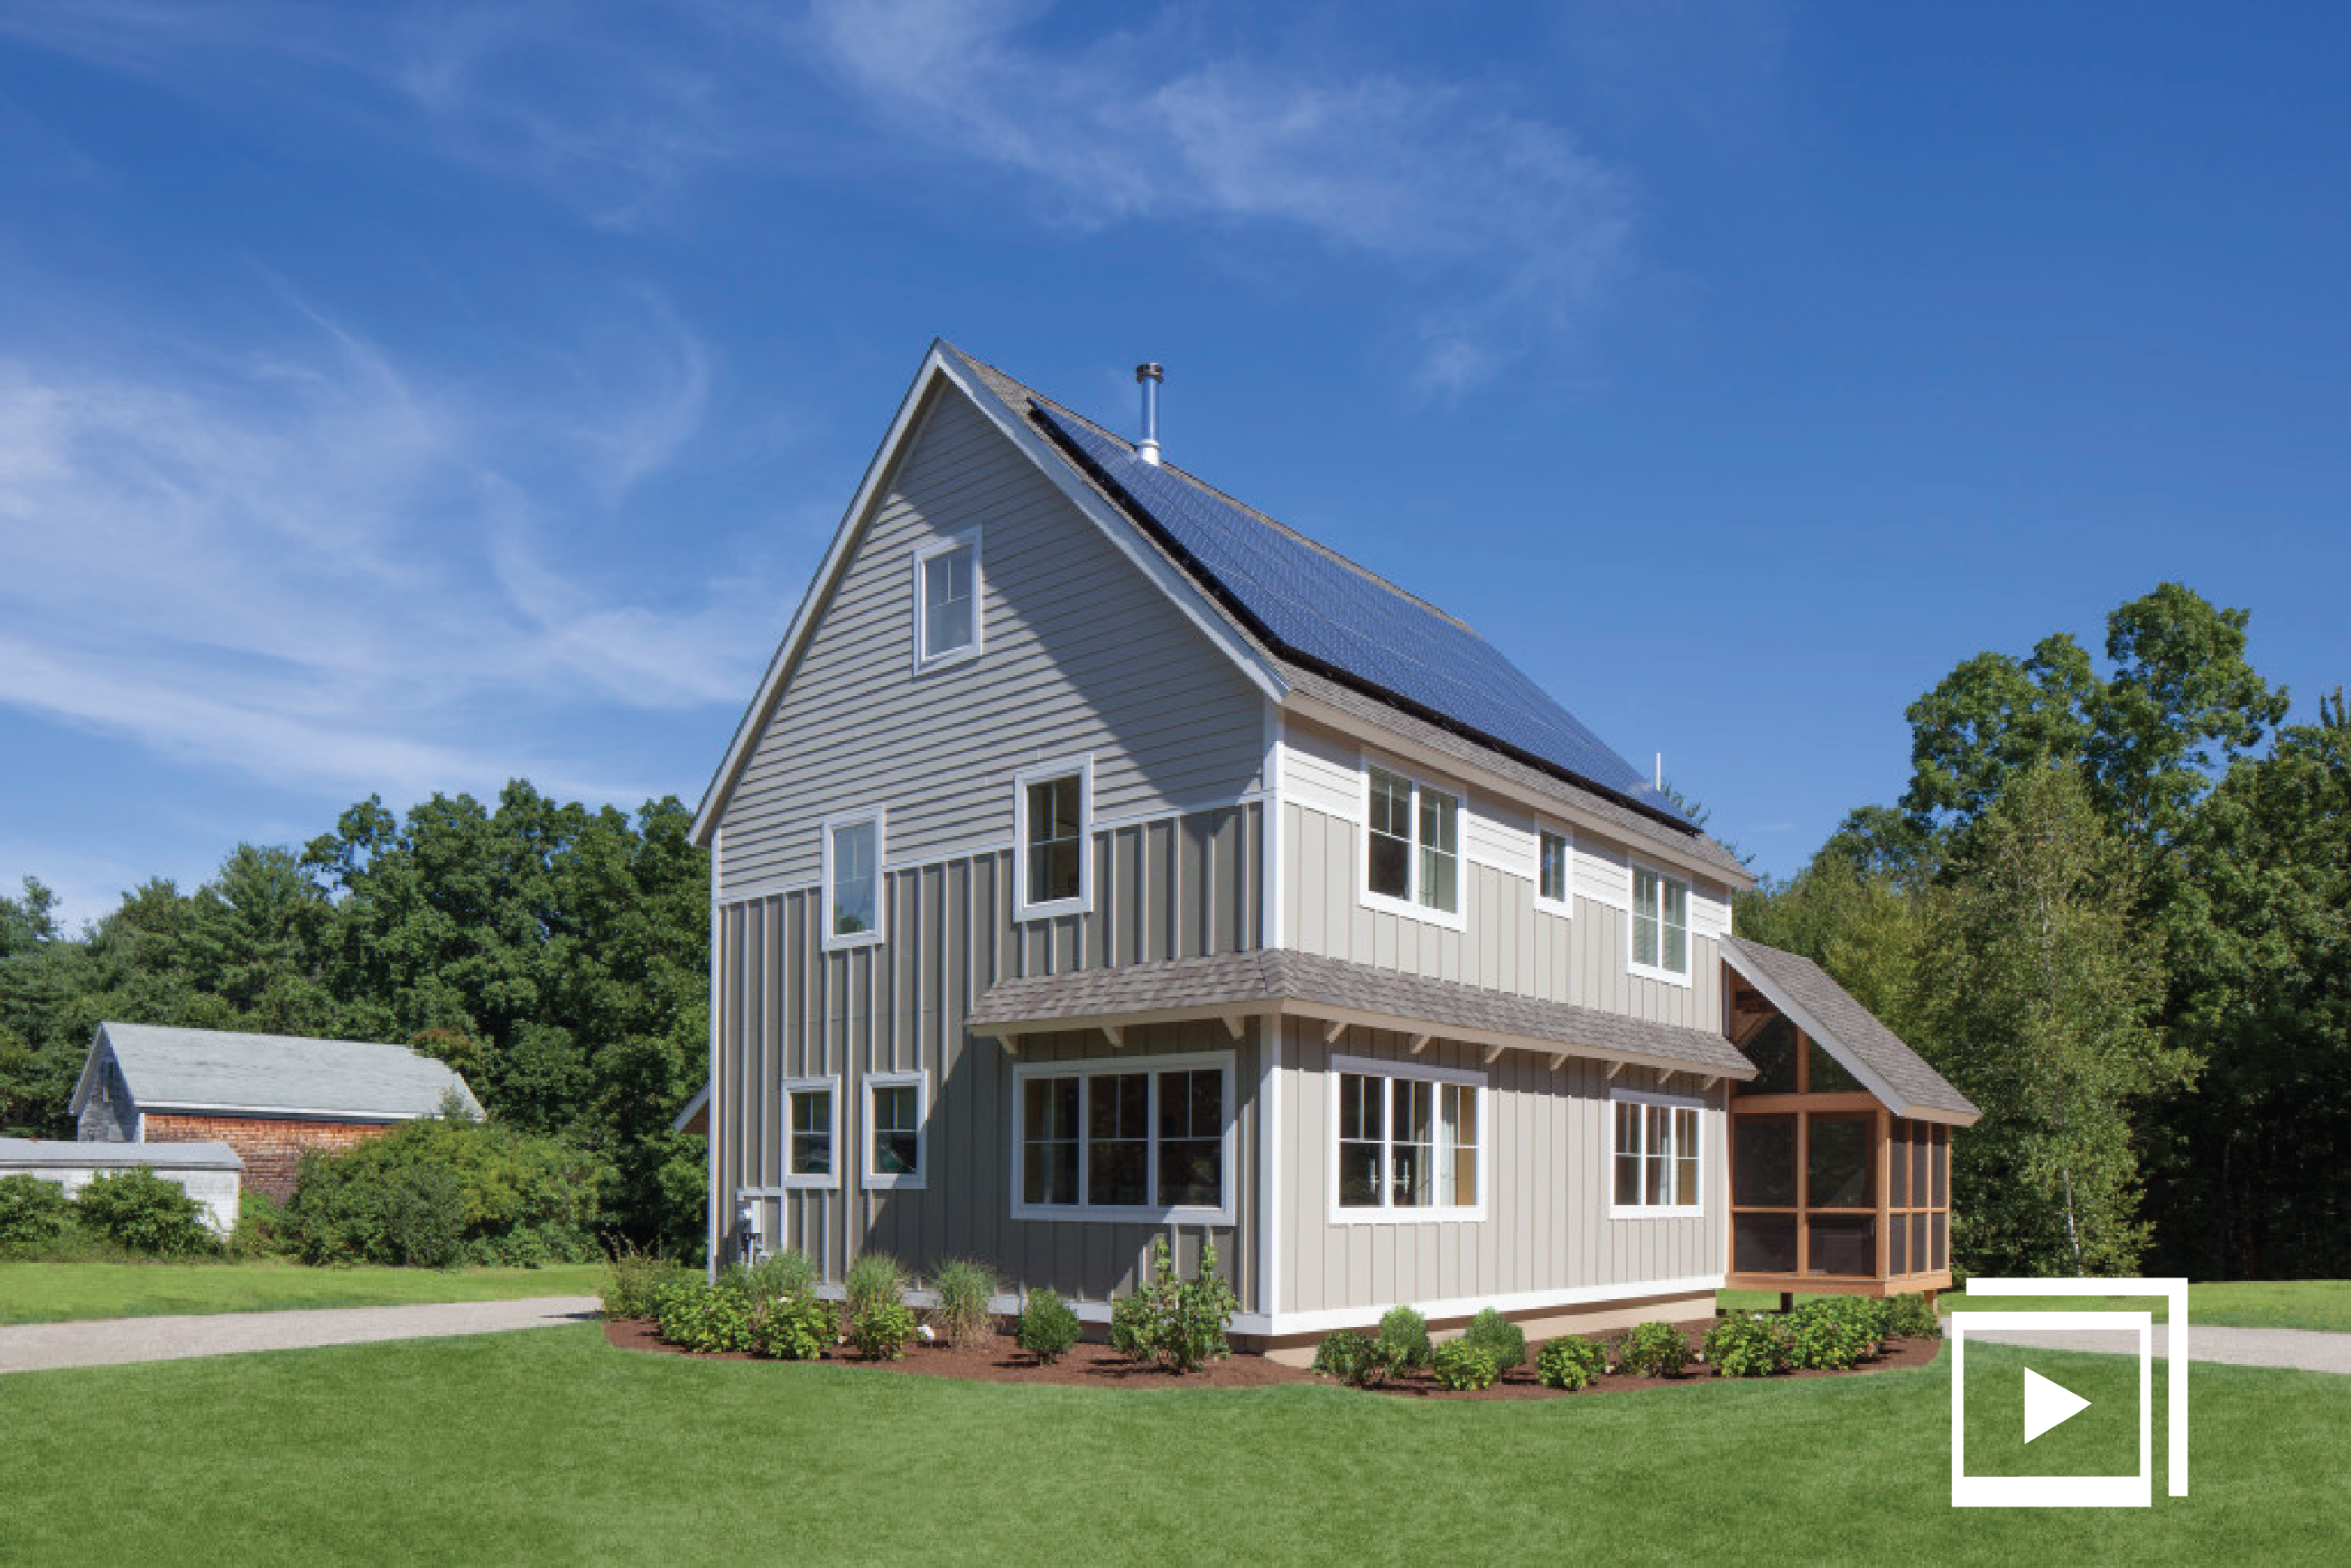 Treat House Mitsubishi Cooling & Heating Modular homes